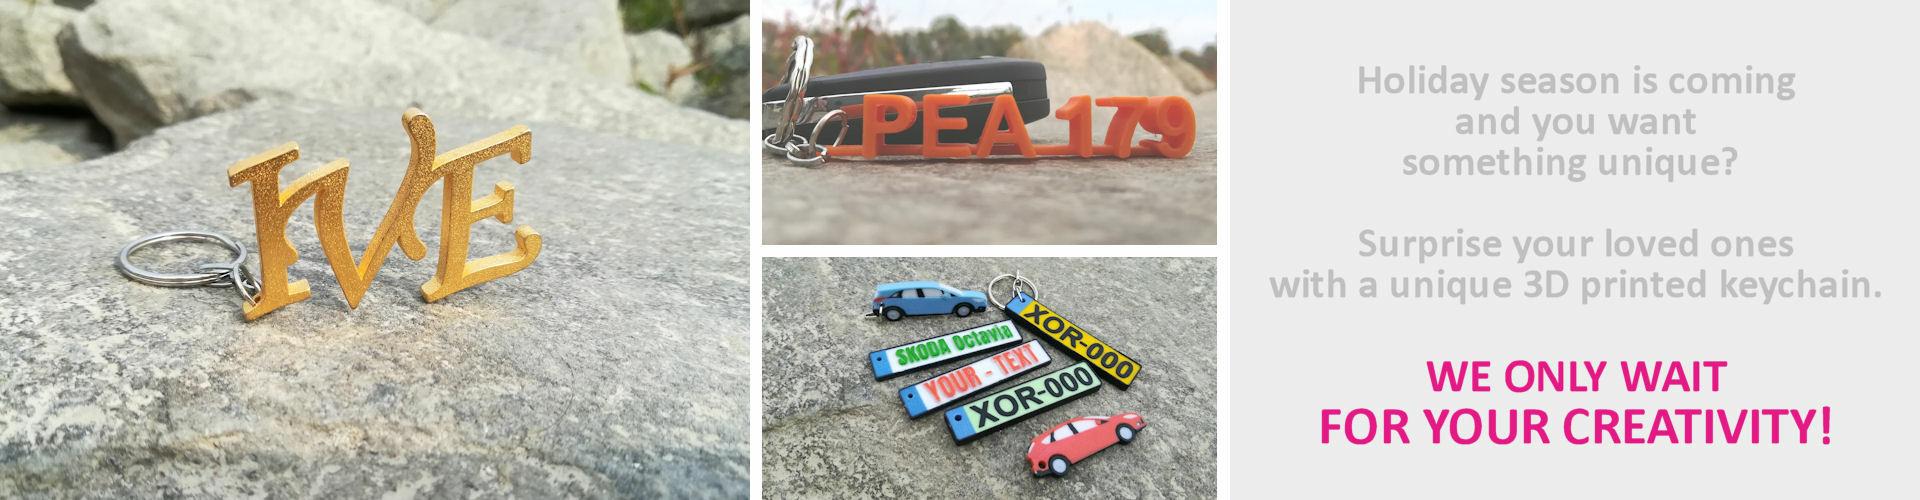 Custom 3D Printed Keychains